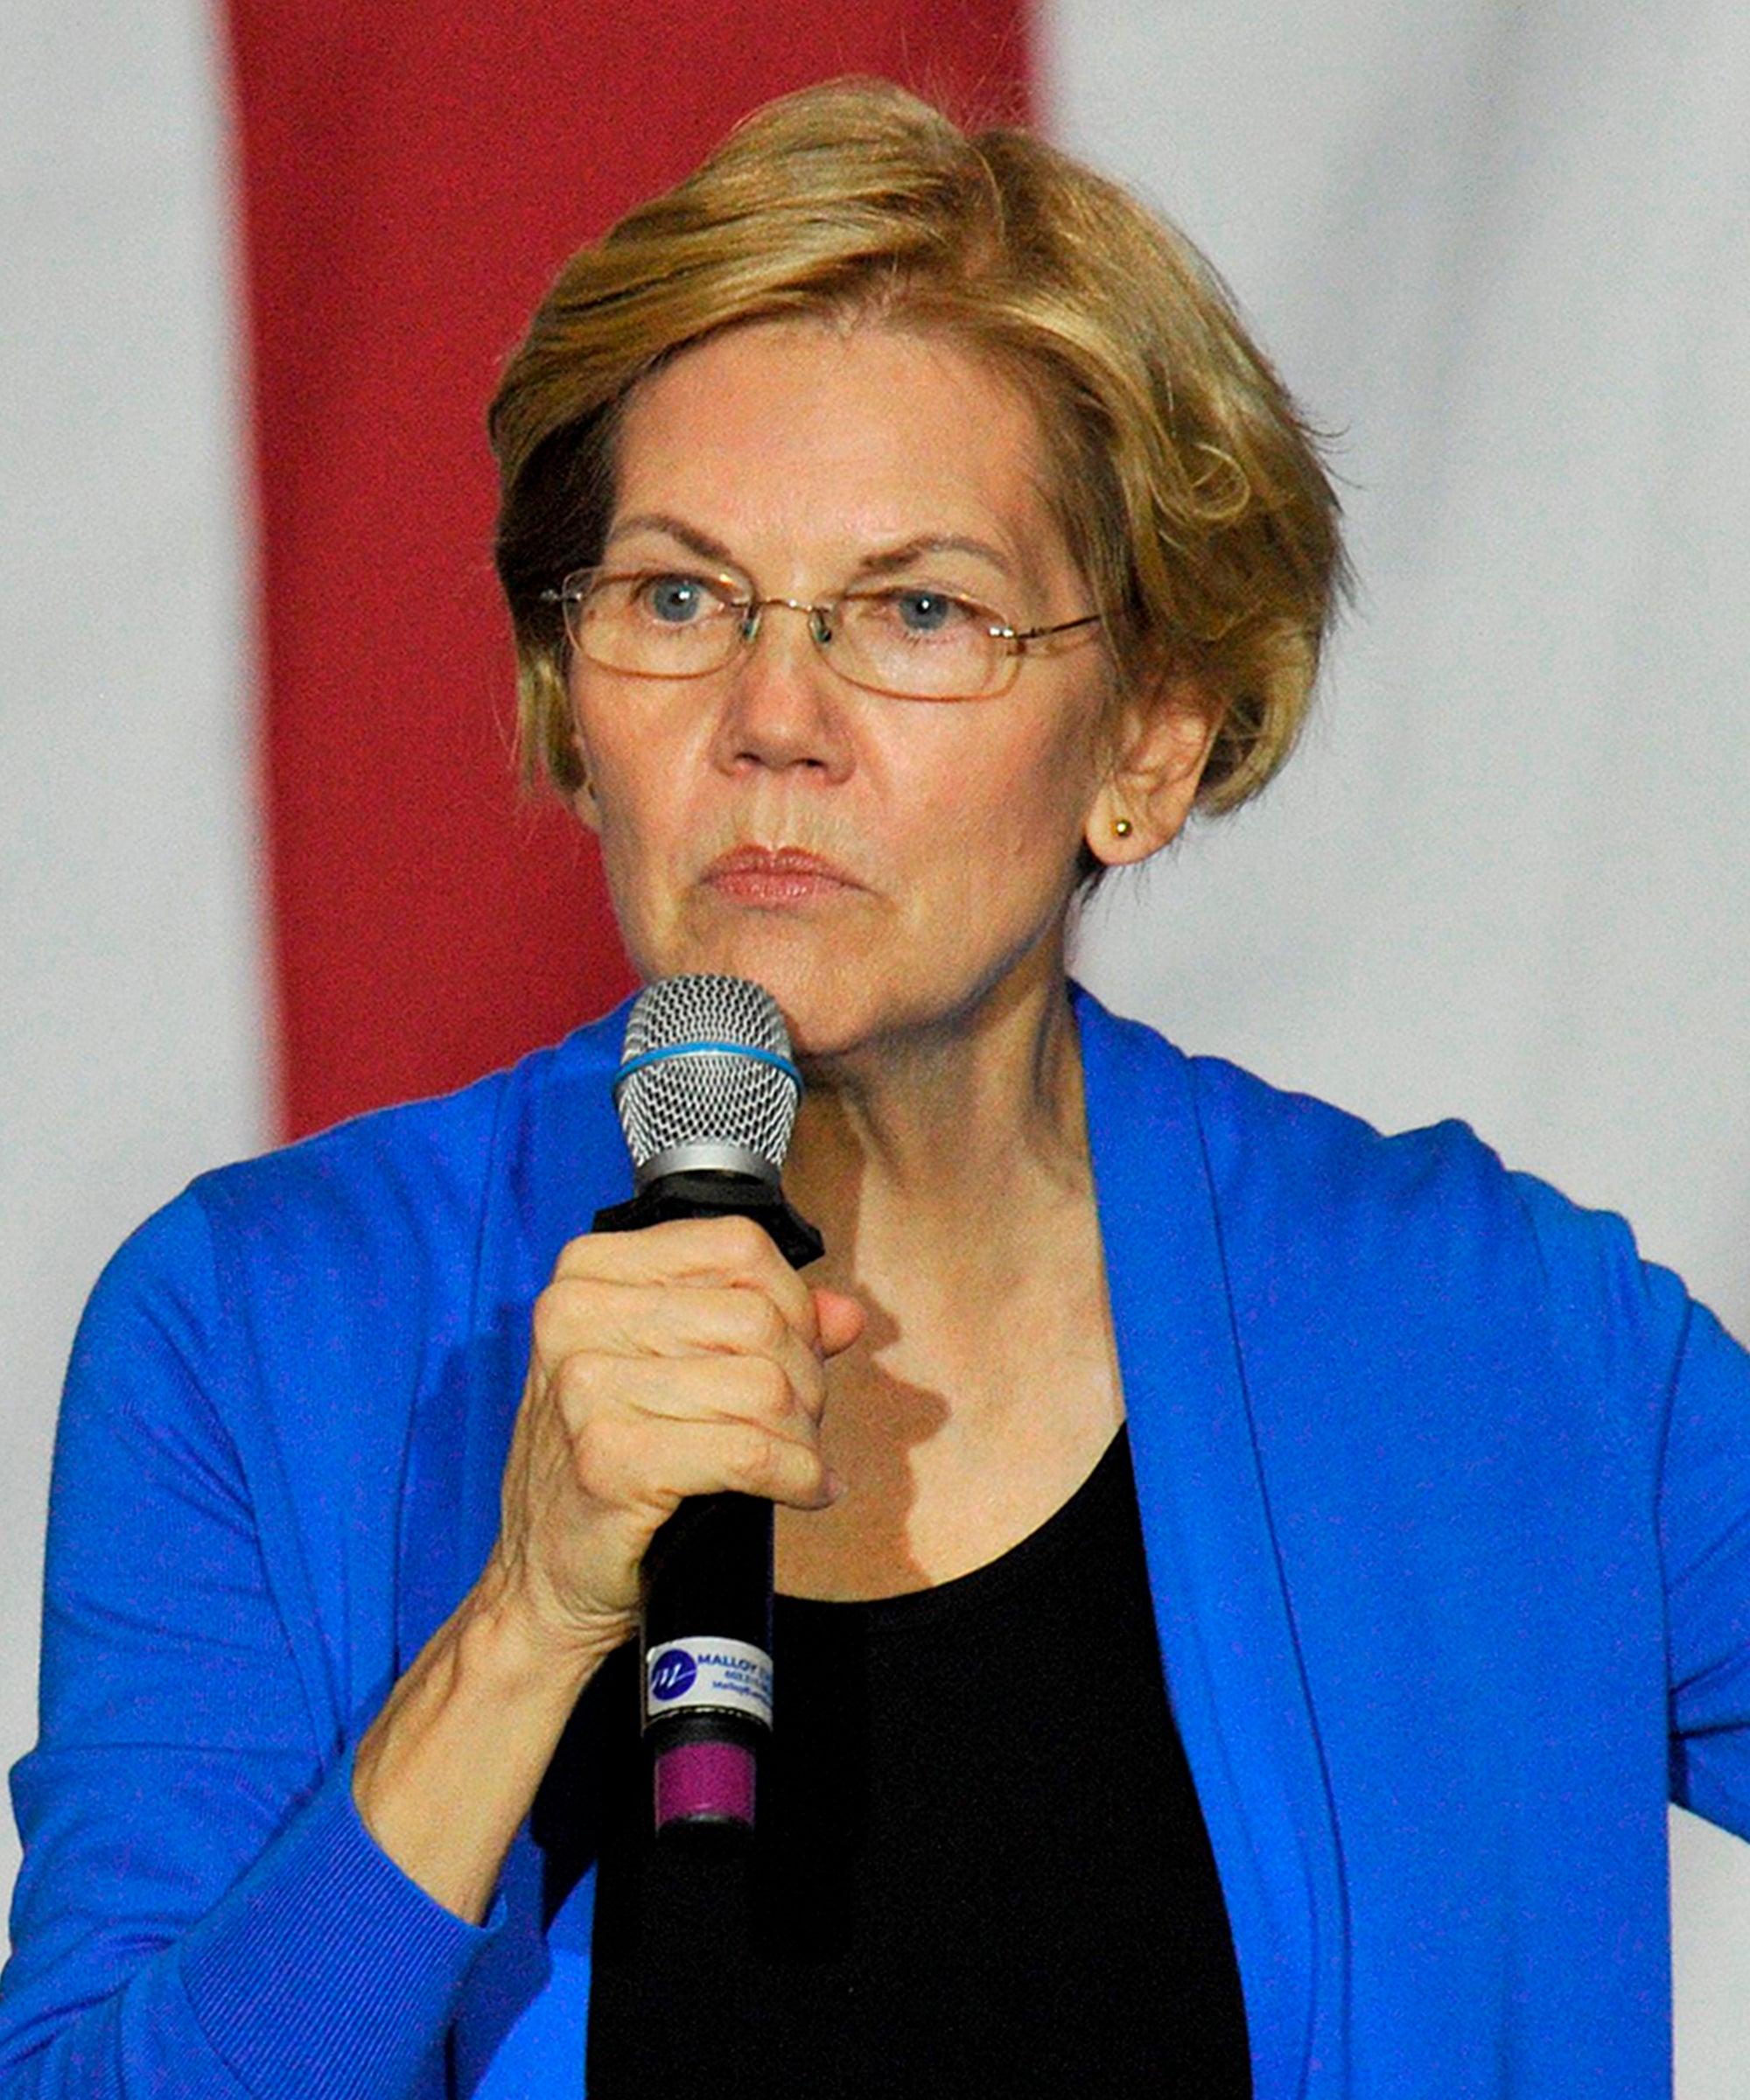 Democratic Candidates Unite To Demand NBC Investigates Sexual Misconduct Allegations